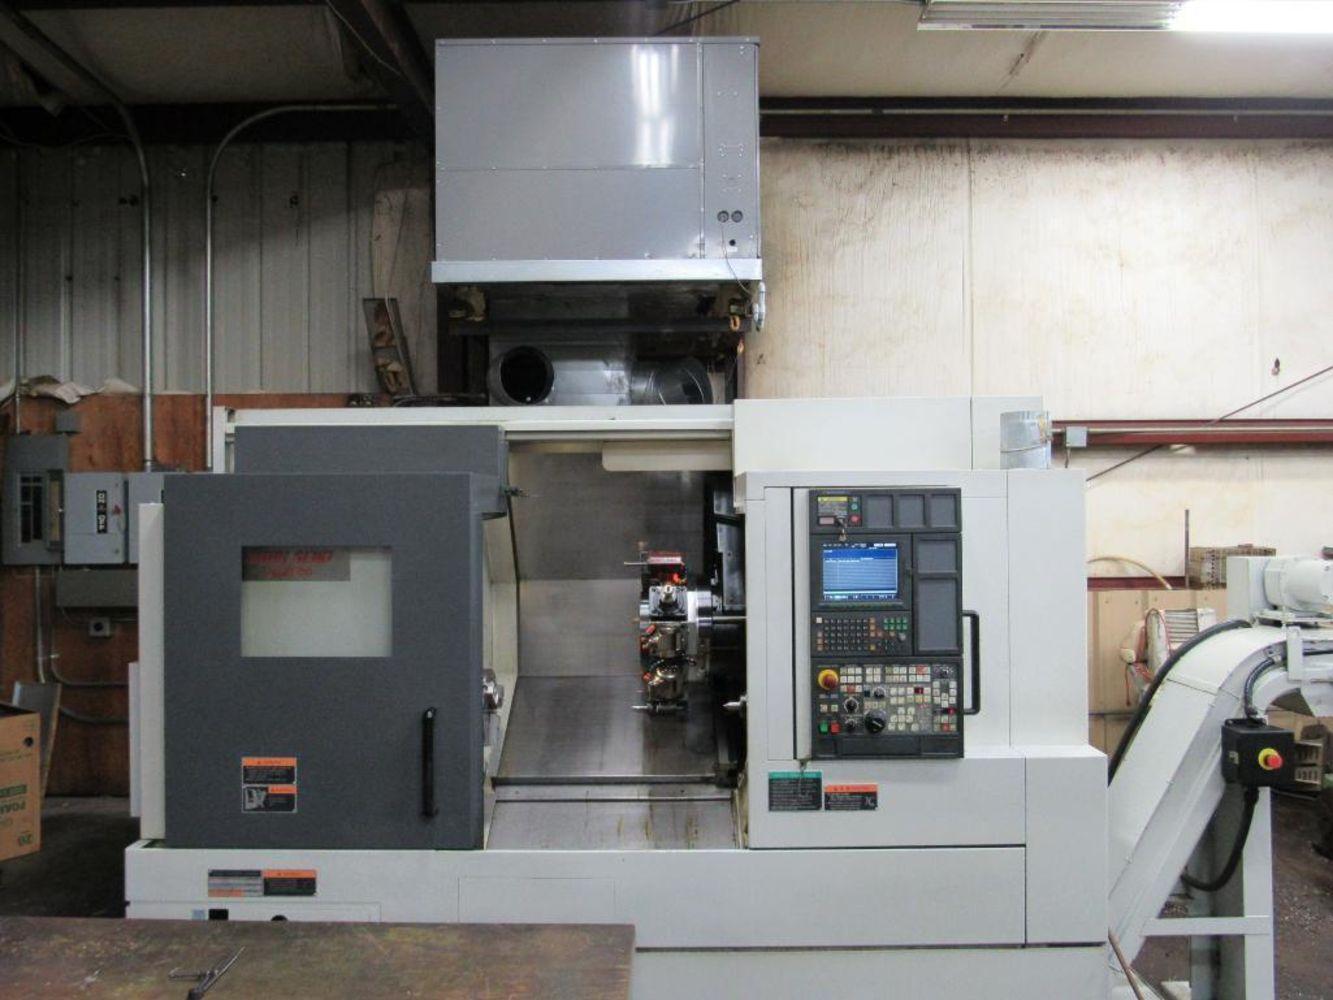 Multi-Axis Mori Seiki CNC Lathes / Milling and Machine Shop Assets - Medearis Machine